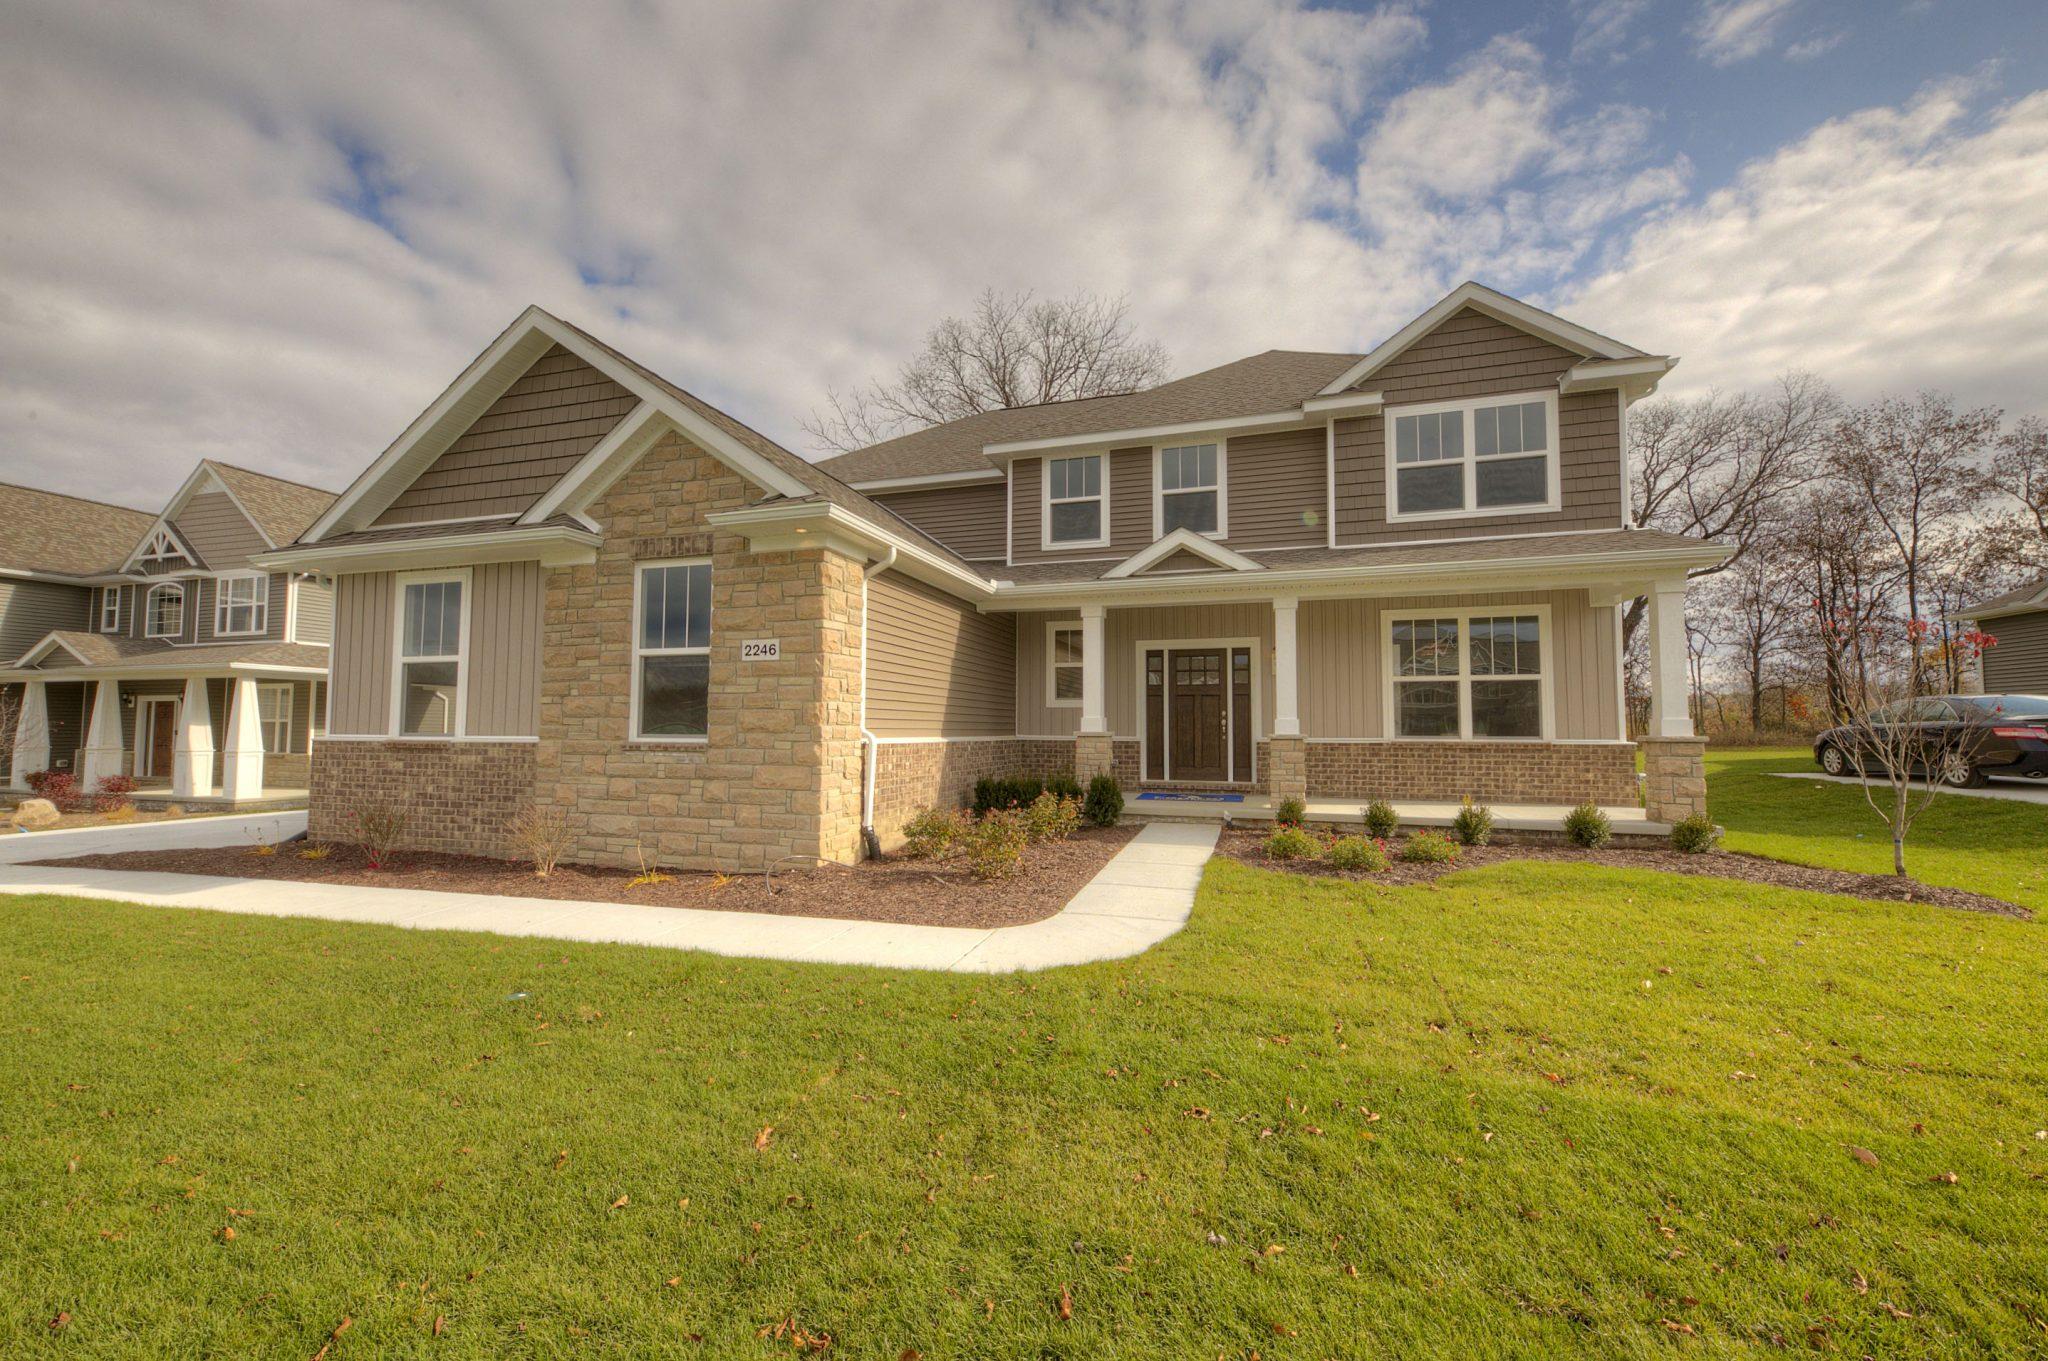 7922 Pamalane Ct (Parcel 1C), Green Oak Township, 48116